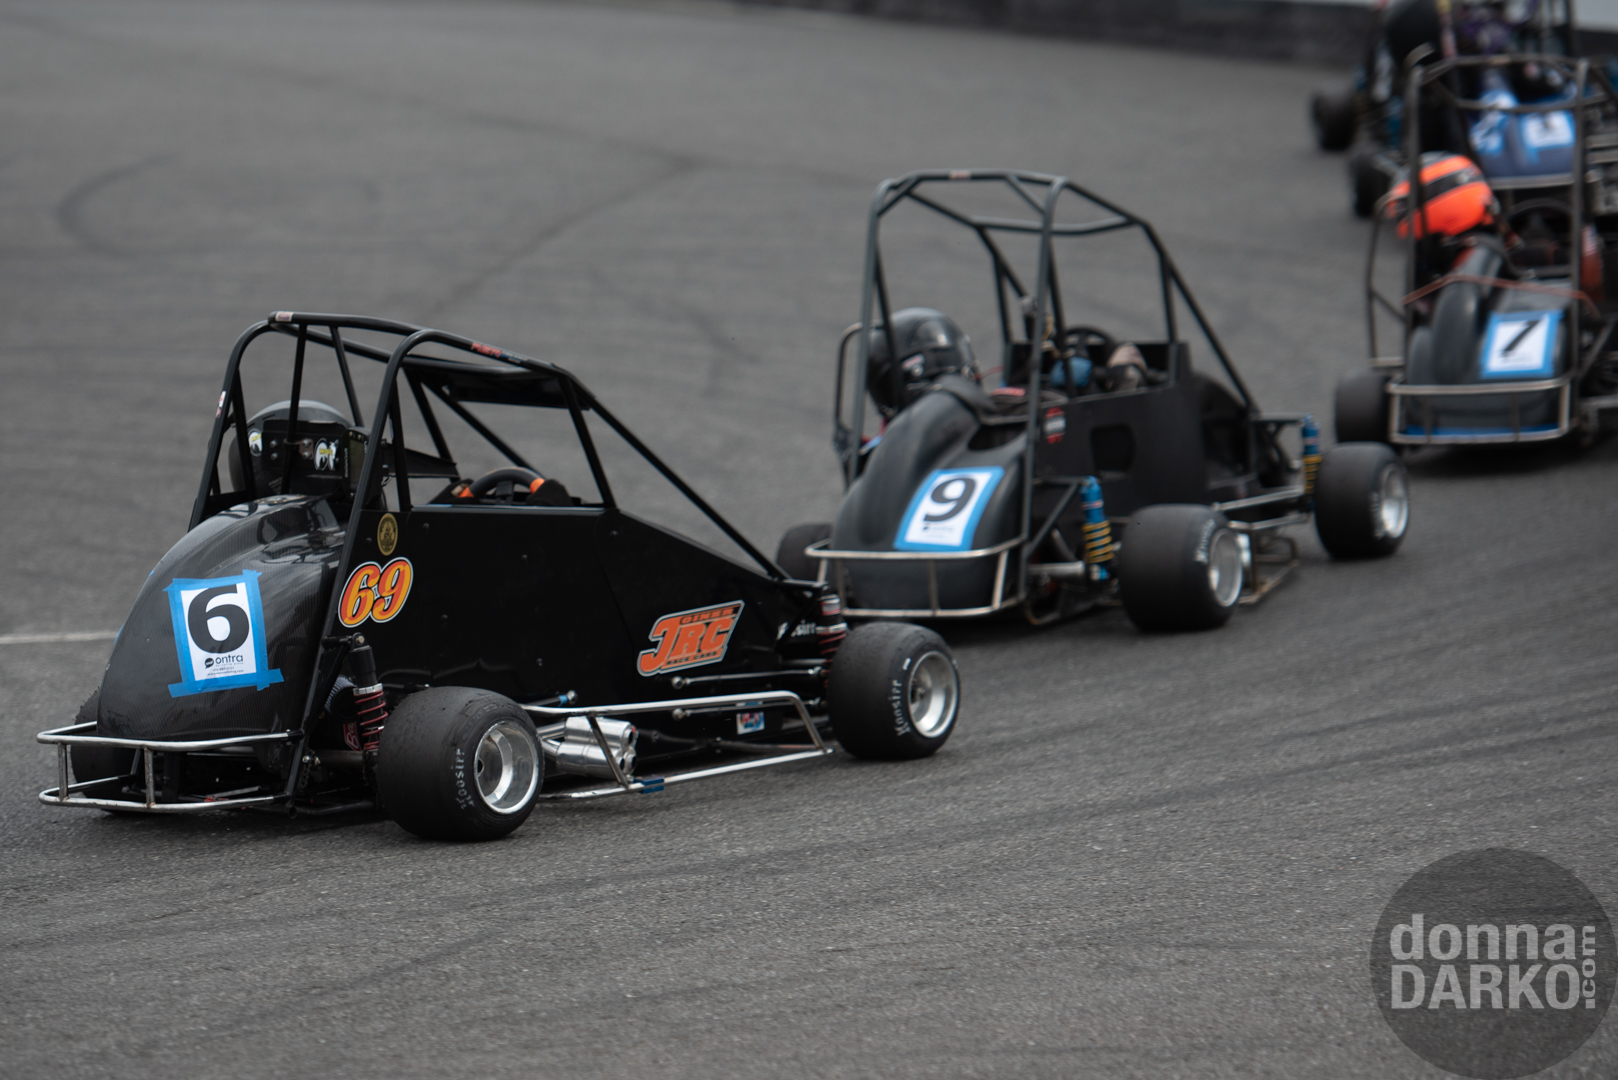 QWMA (Racing) 8-11-2019 DSC_7219.jpg